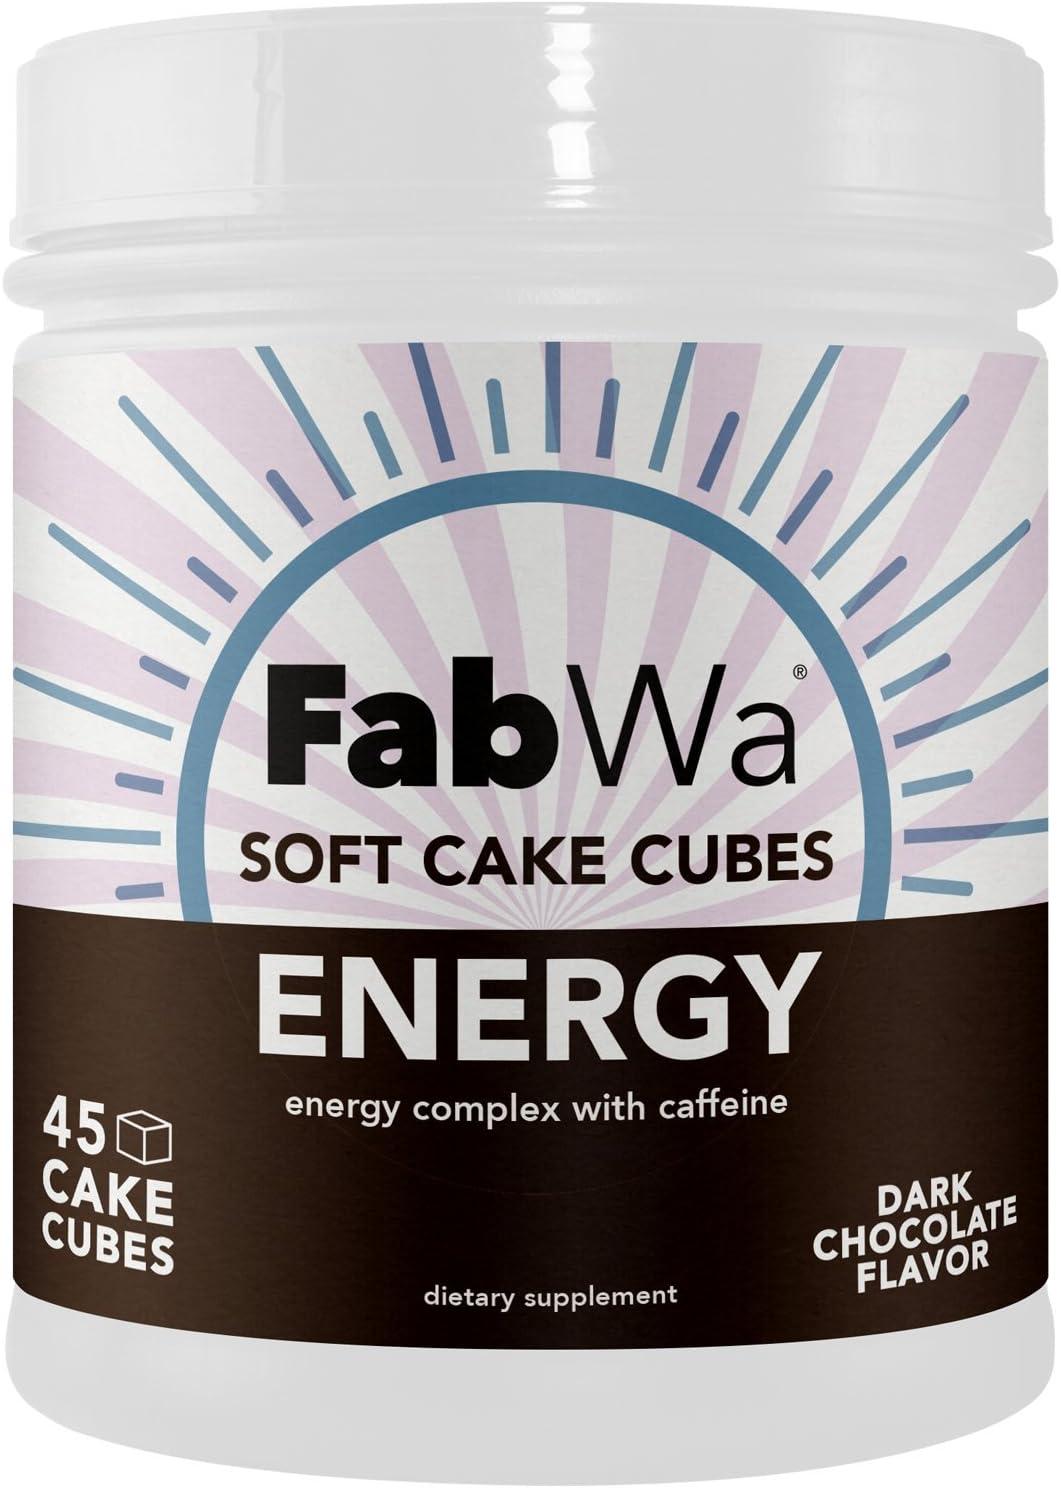 Fabwa Soft Cake Energy Washington Mall Chews Chocolate 45 Dark Count Philadelphia Mall